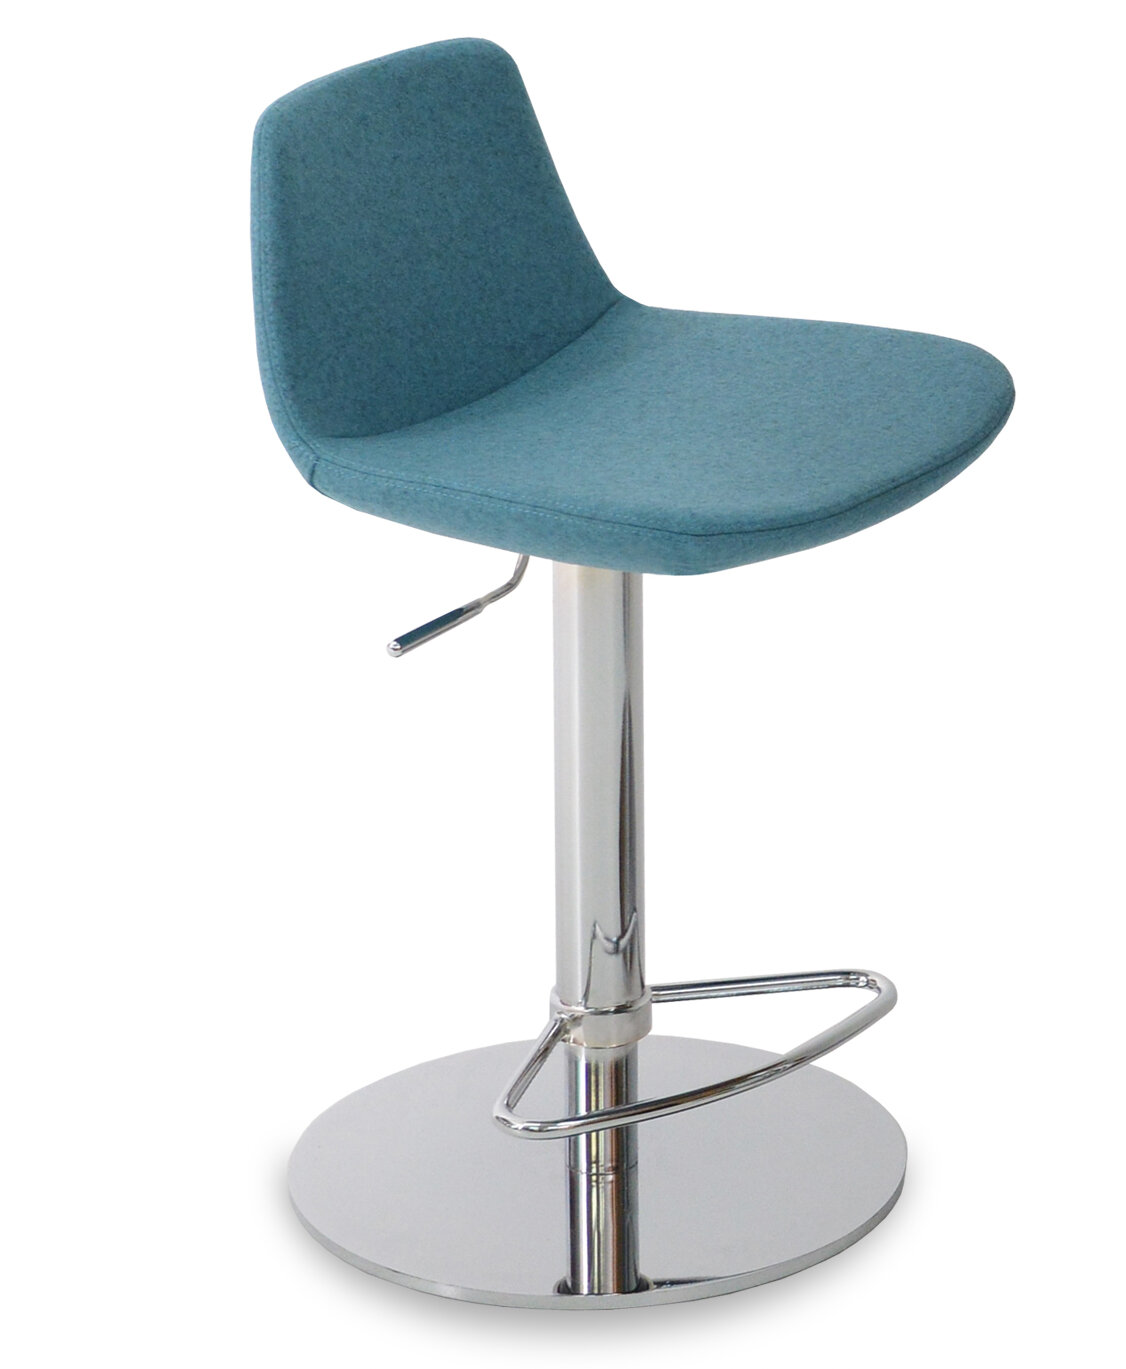 sohoConcept Pera Piston Adjustable Height Bar Stool Upholstery: Organic Wool Fabric, Finish: Chrome, Color: Charcoal